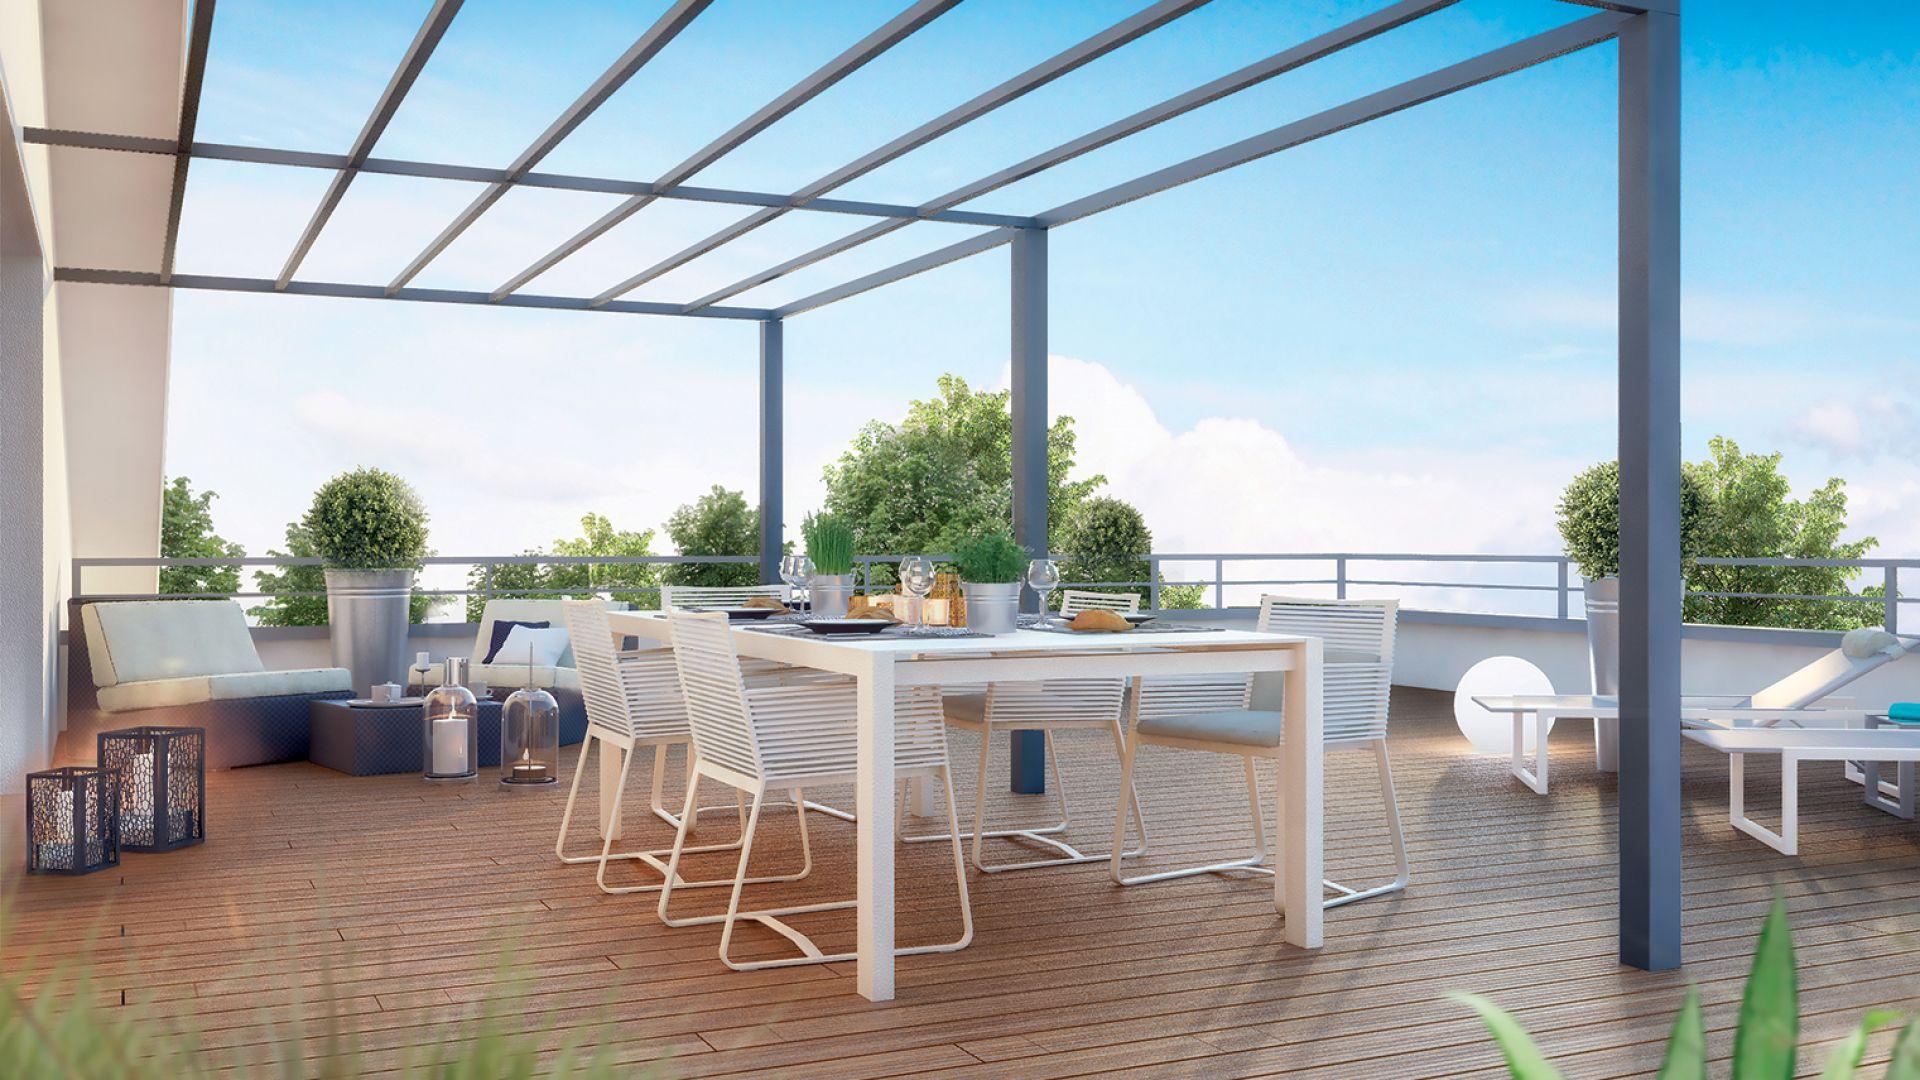 Les balcons du midi green city immobilier for Terrasse et cie immobilier